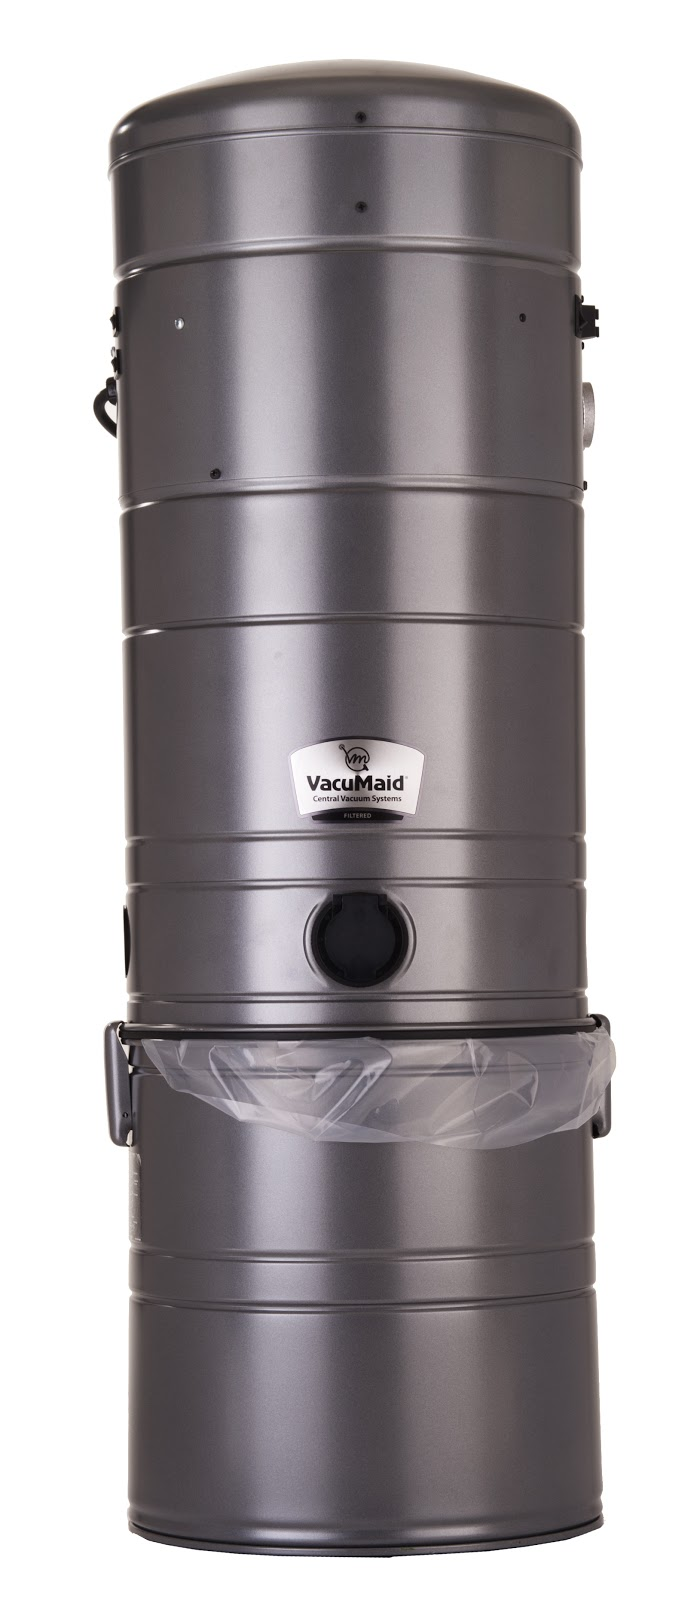 VacuMaid SR60 Central Vacuum Power Unit